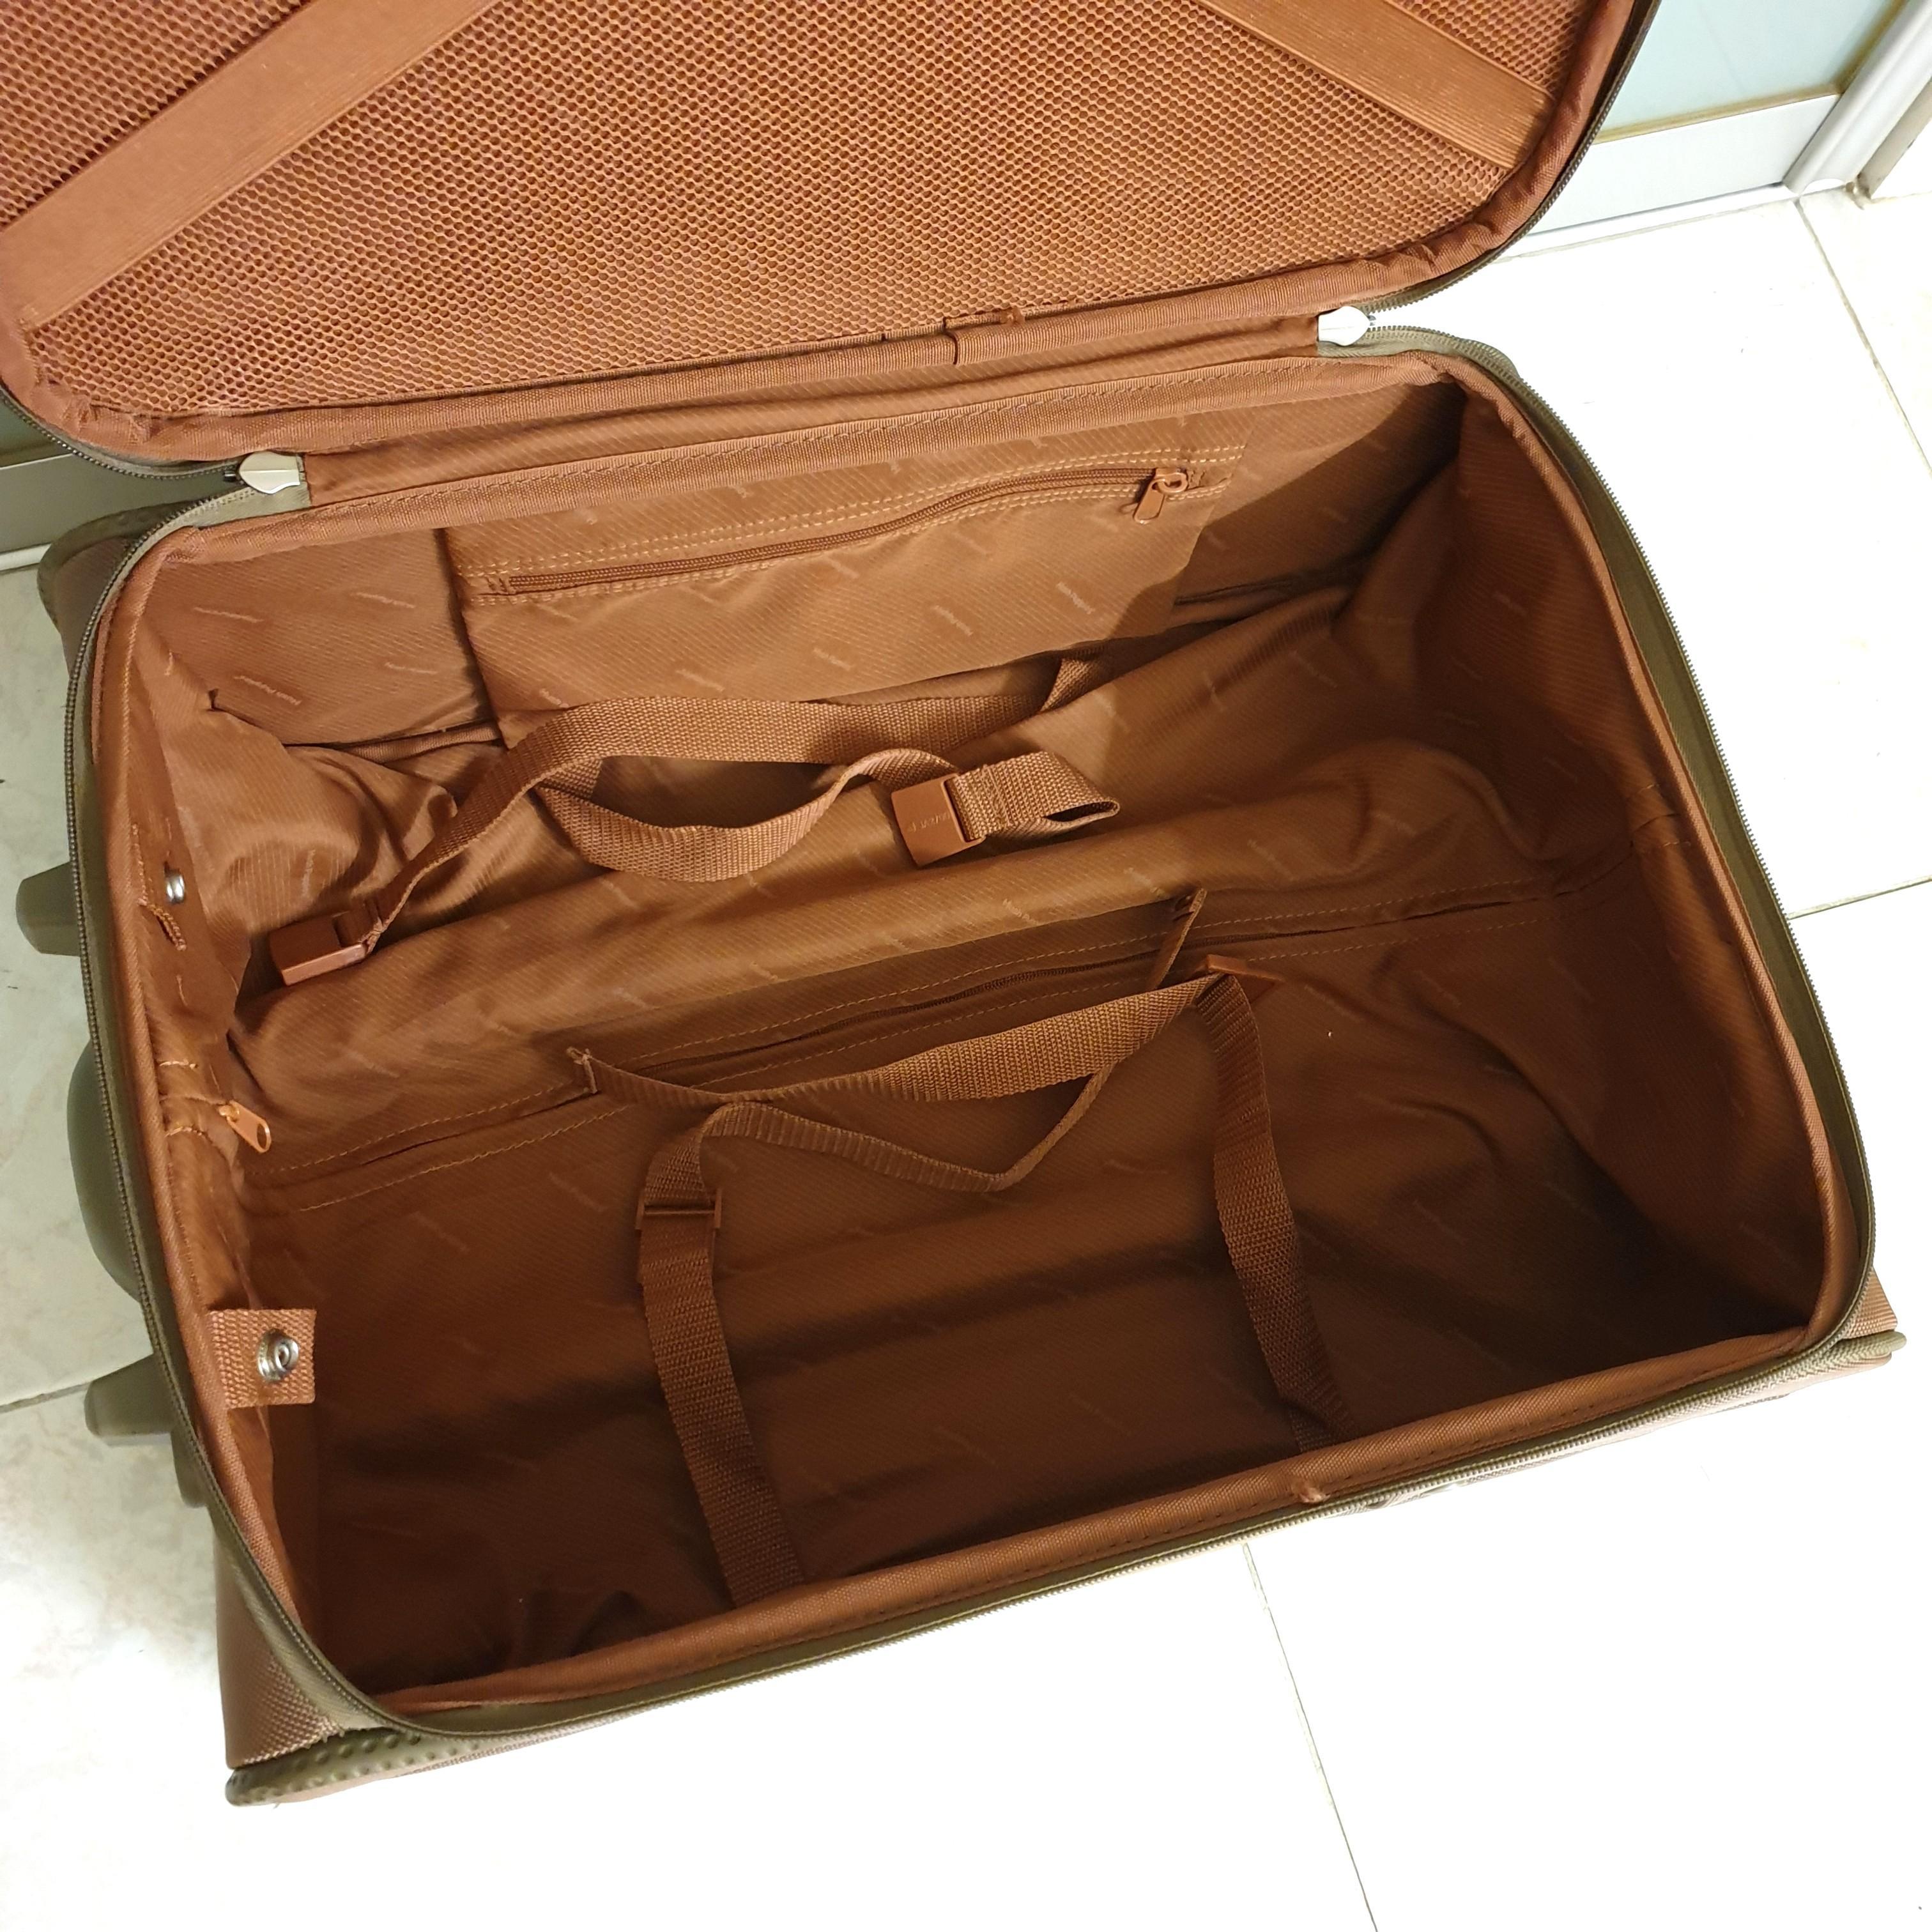 [Negotiable] Hush Puppies Luggage